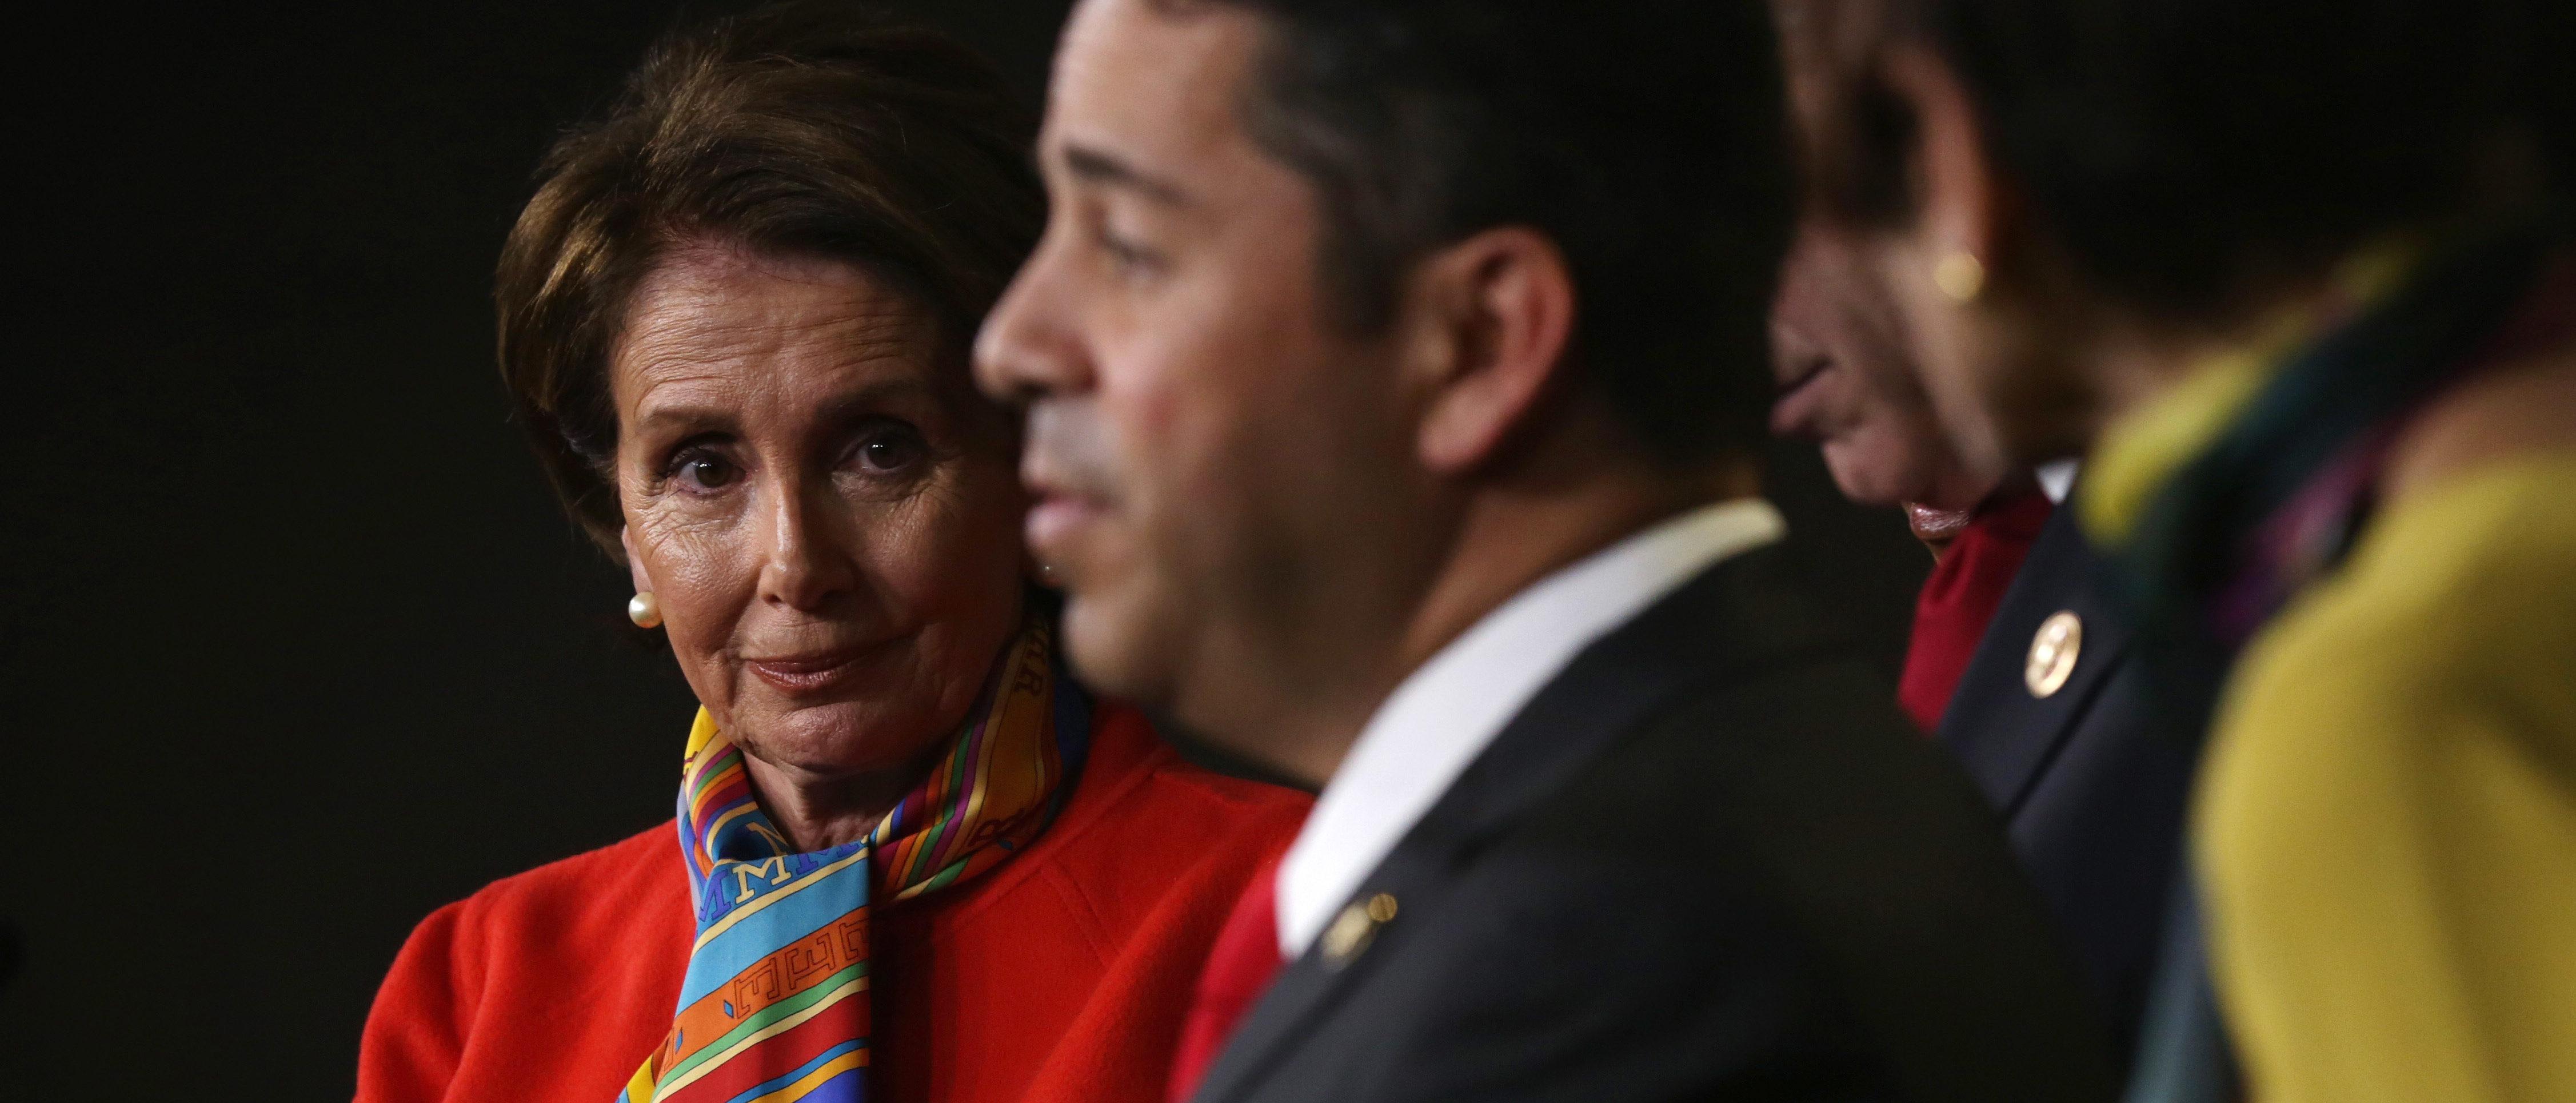 Top House Democrat Calls For Impeachment Investigation